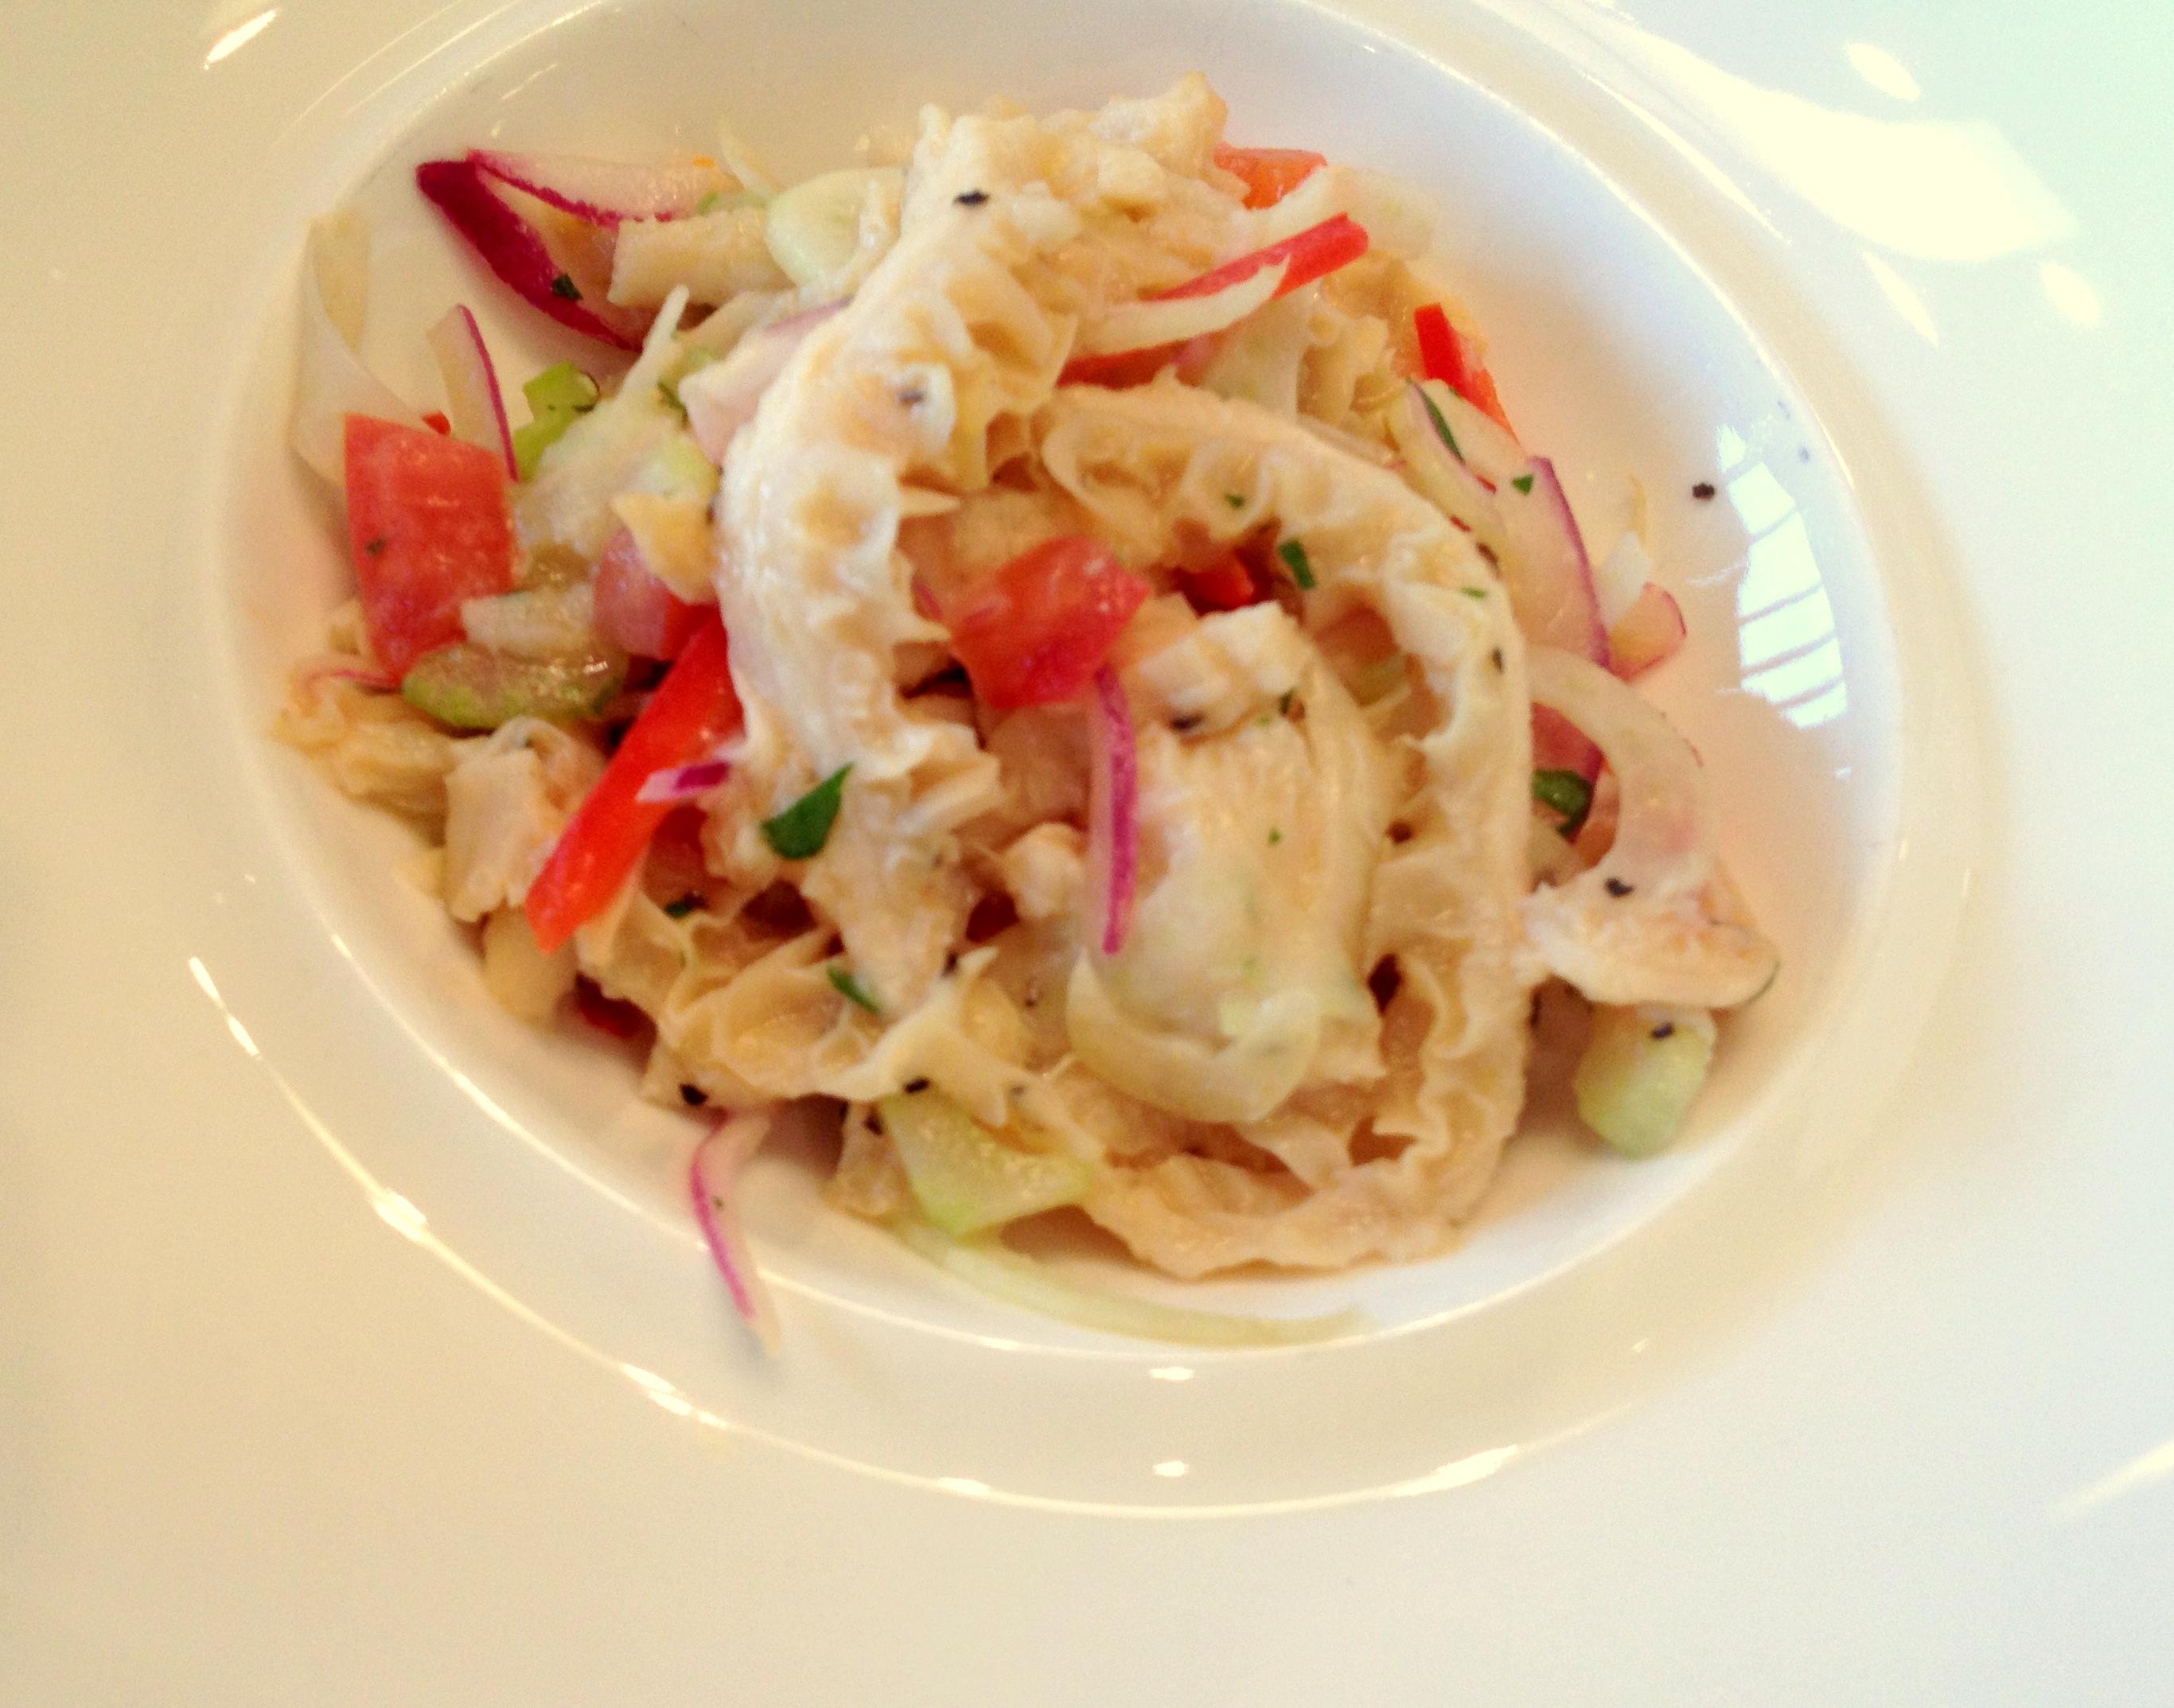 Tuscan tripe salad